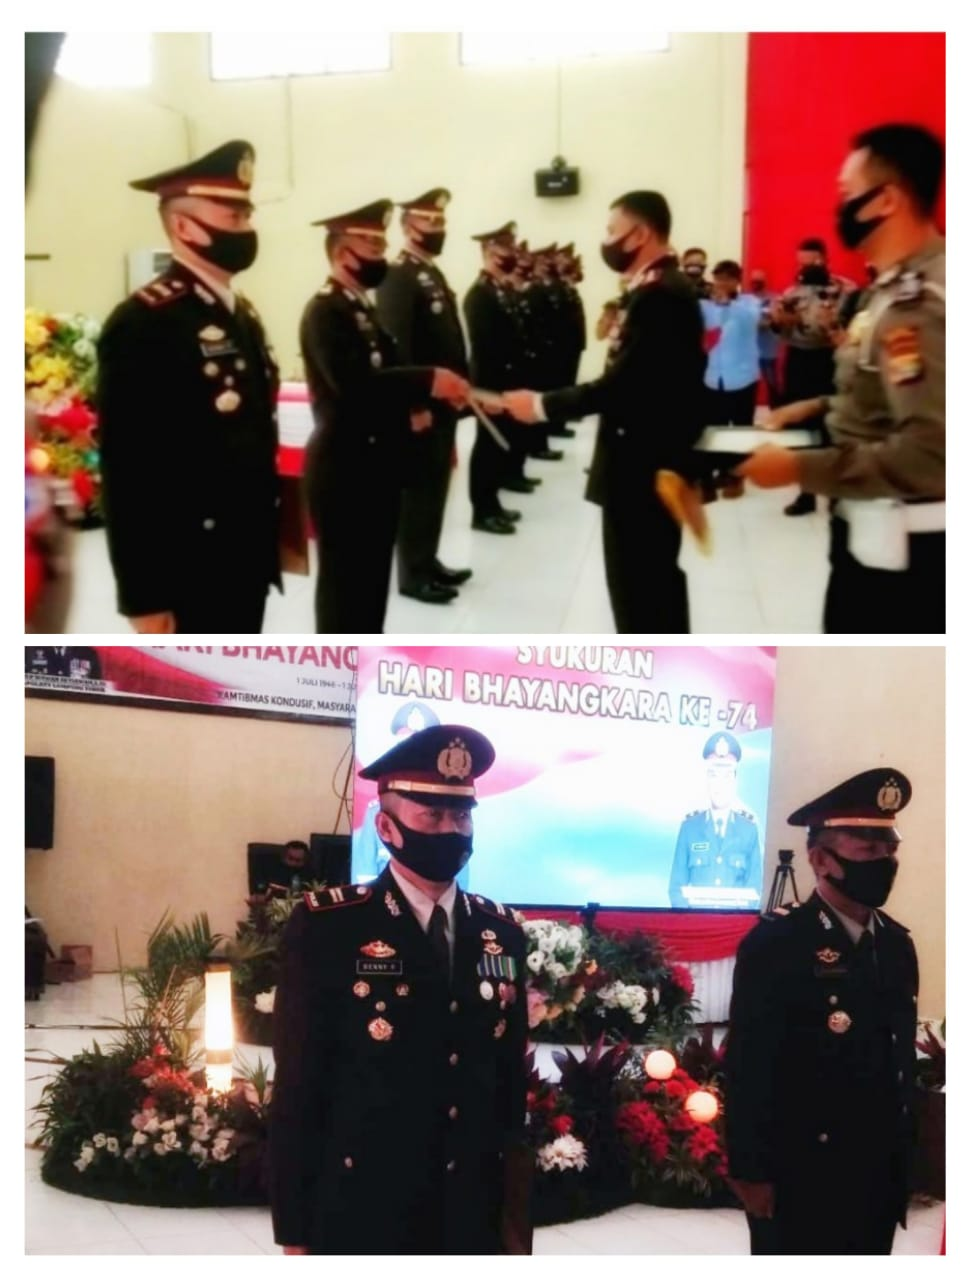 HUT Ke-74 Bhayangkara Polsek Way Jepara Dapat Penghargaan Terbaik Satu Dari Kapolres Lamtim